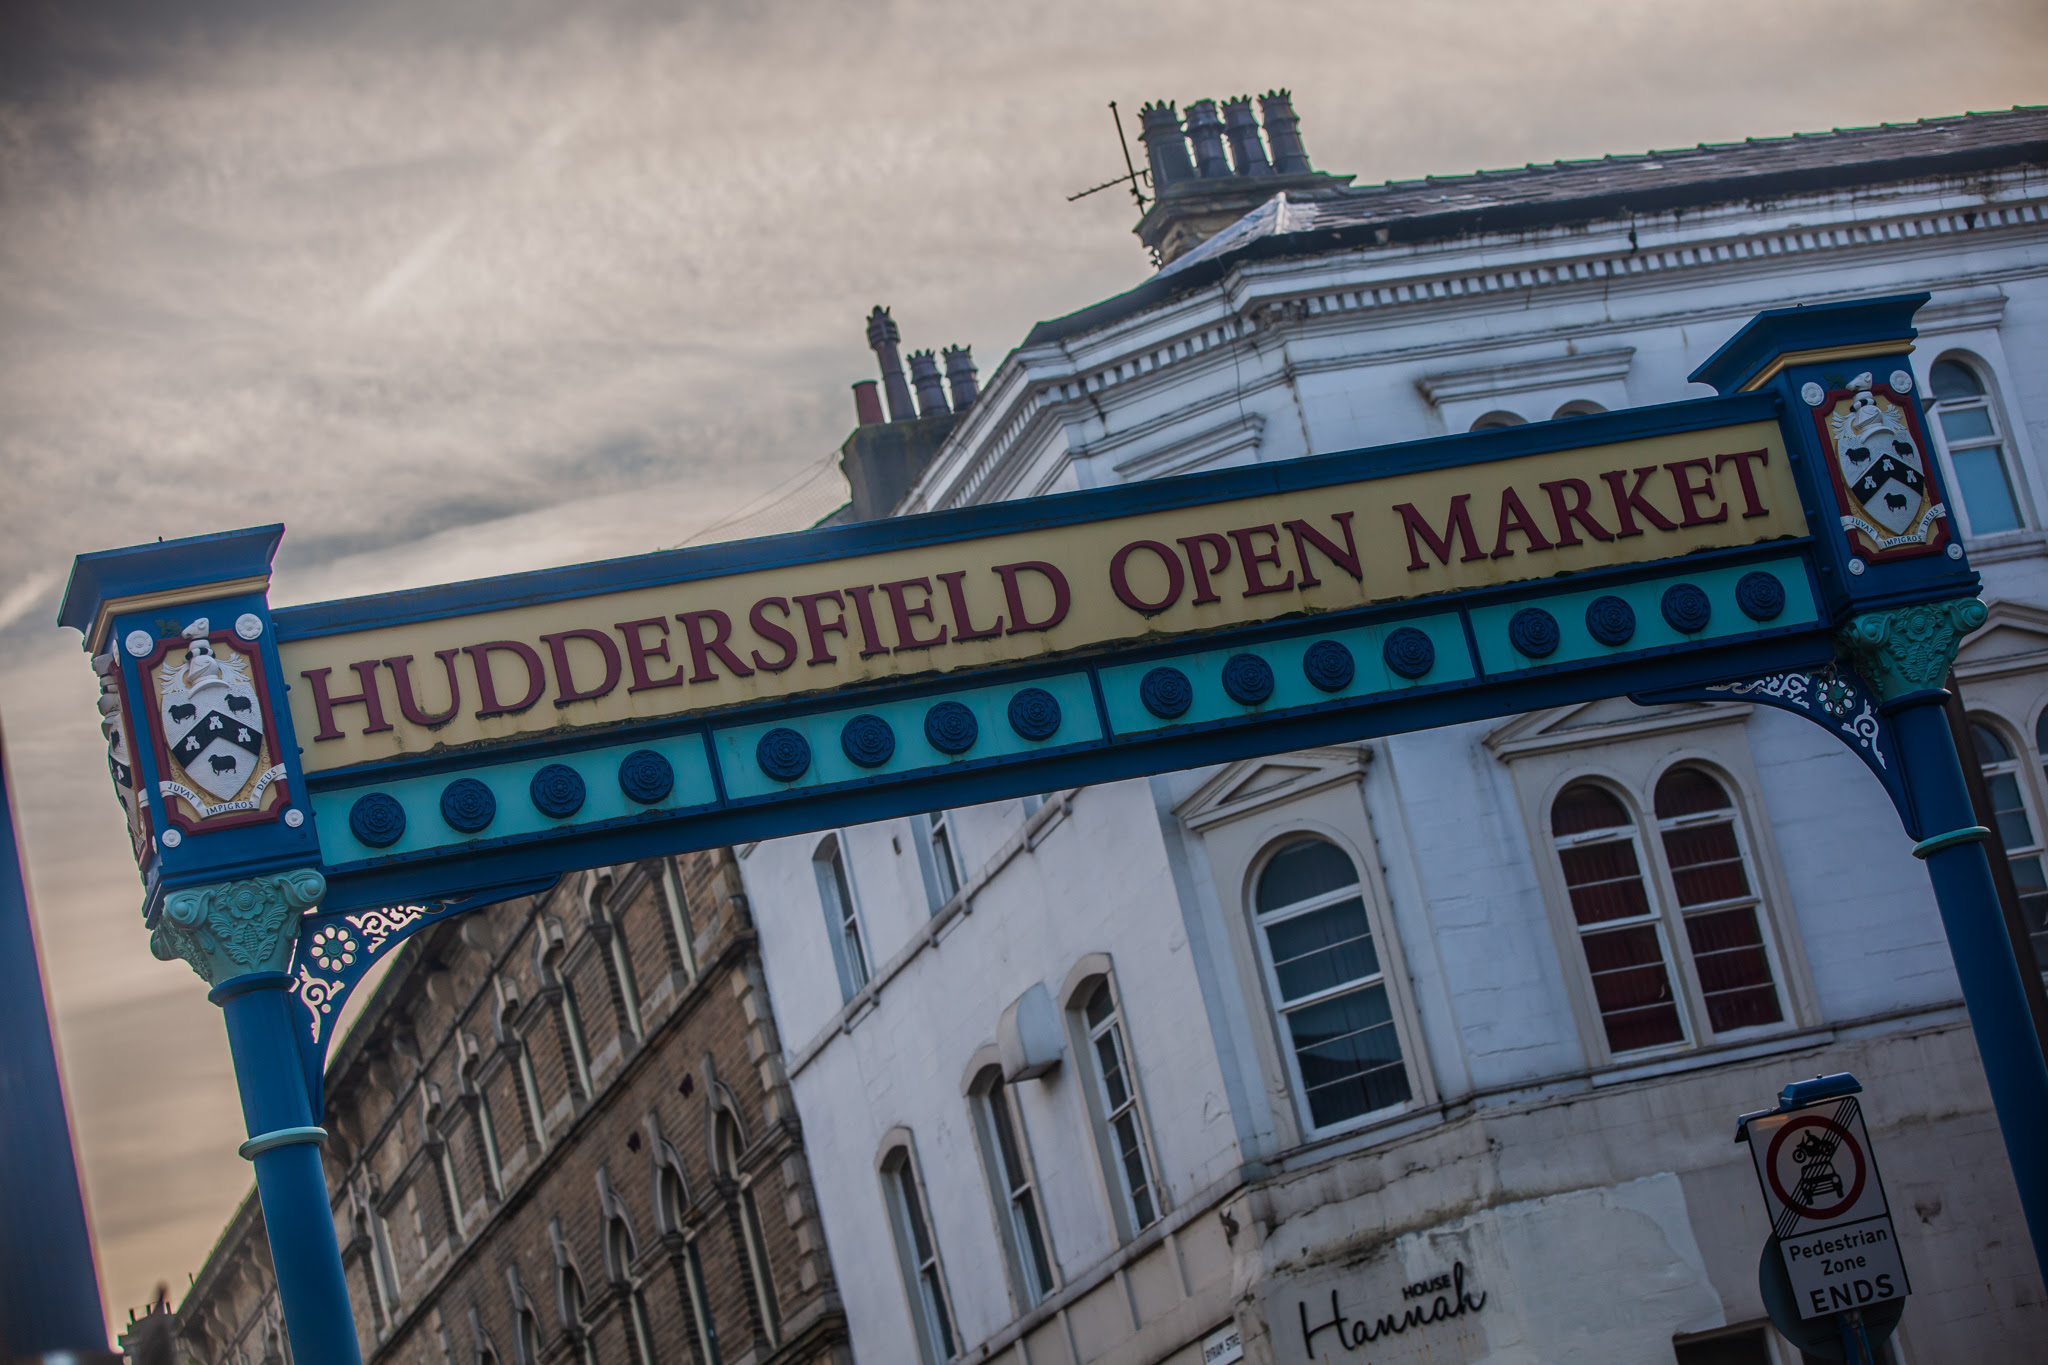 Planned improvements to Huddersfield Open Market reach new milestone